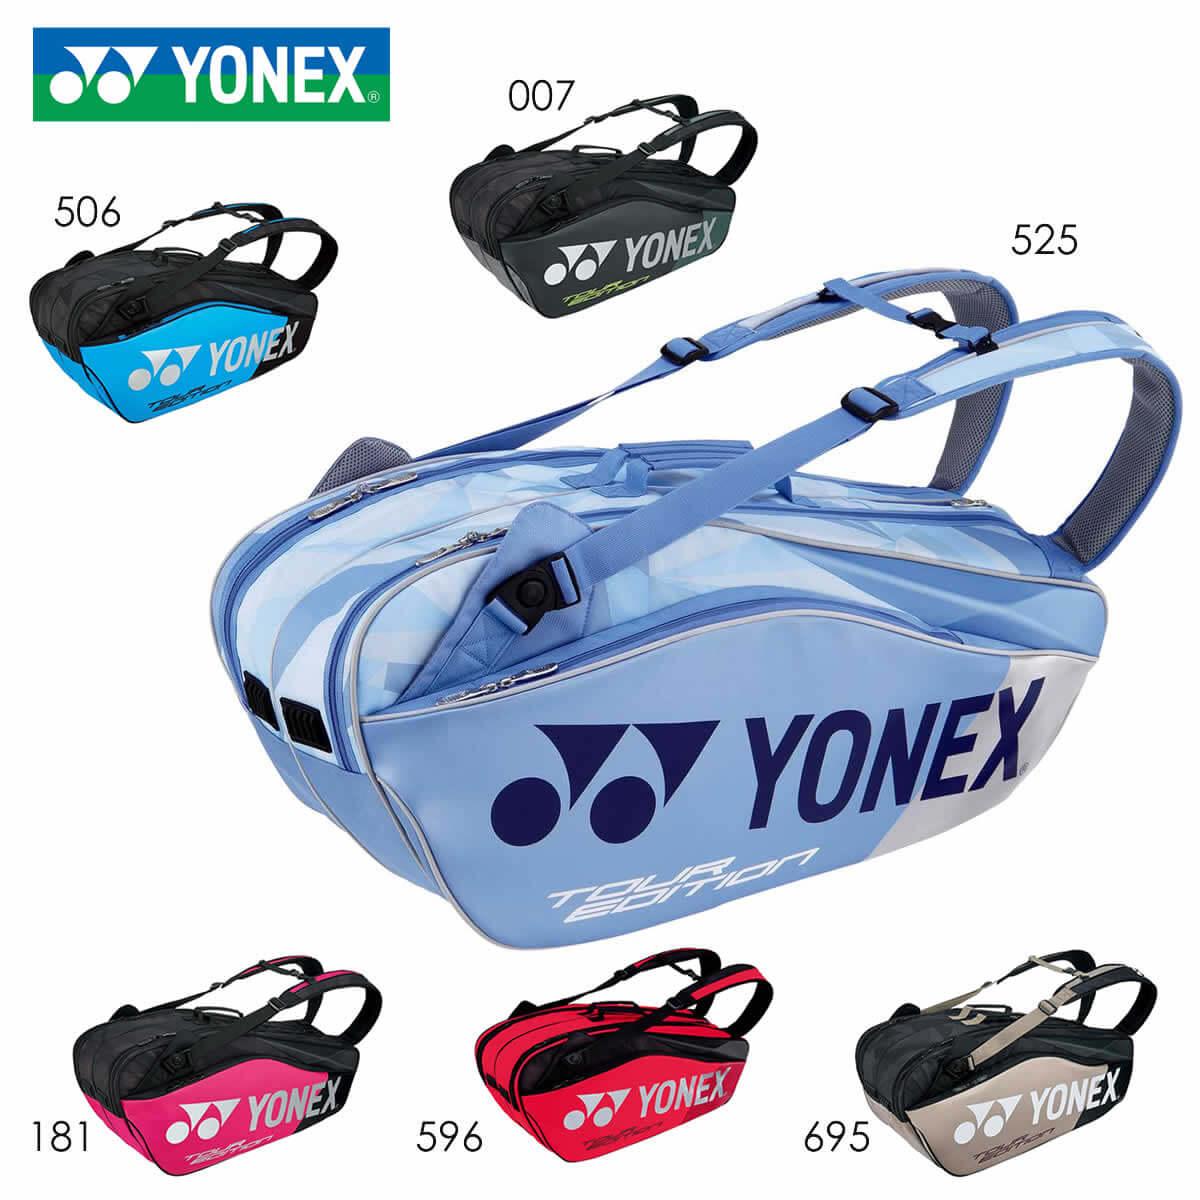 YONEX BAG1802R ラケットバッグ6(リュック付き) テニス・バドミントンバッグ ヨネックス 2018FW【取り寄せ】